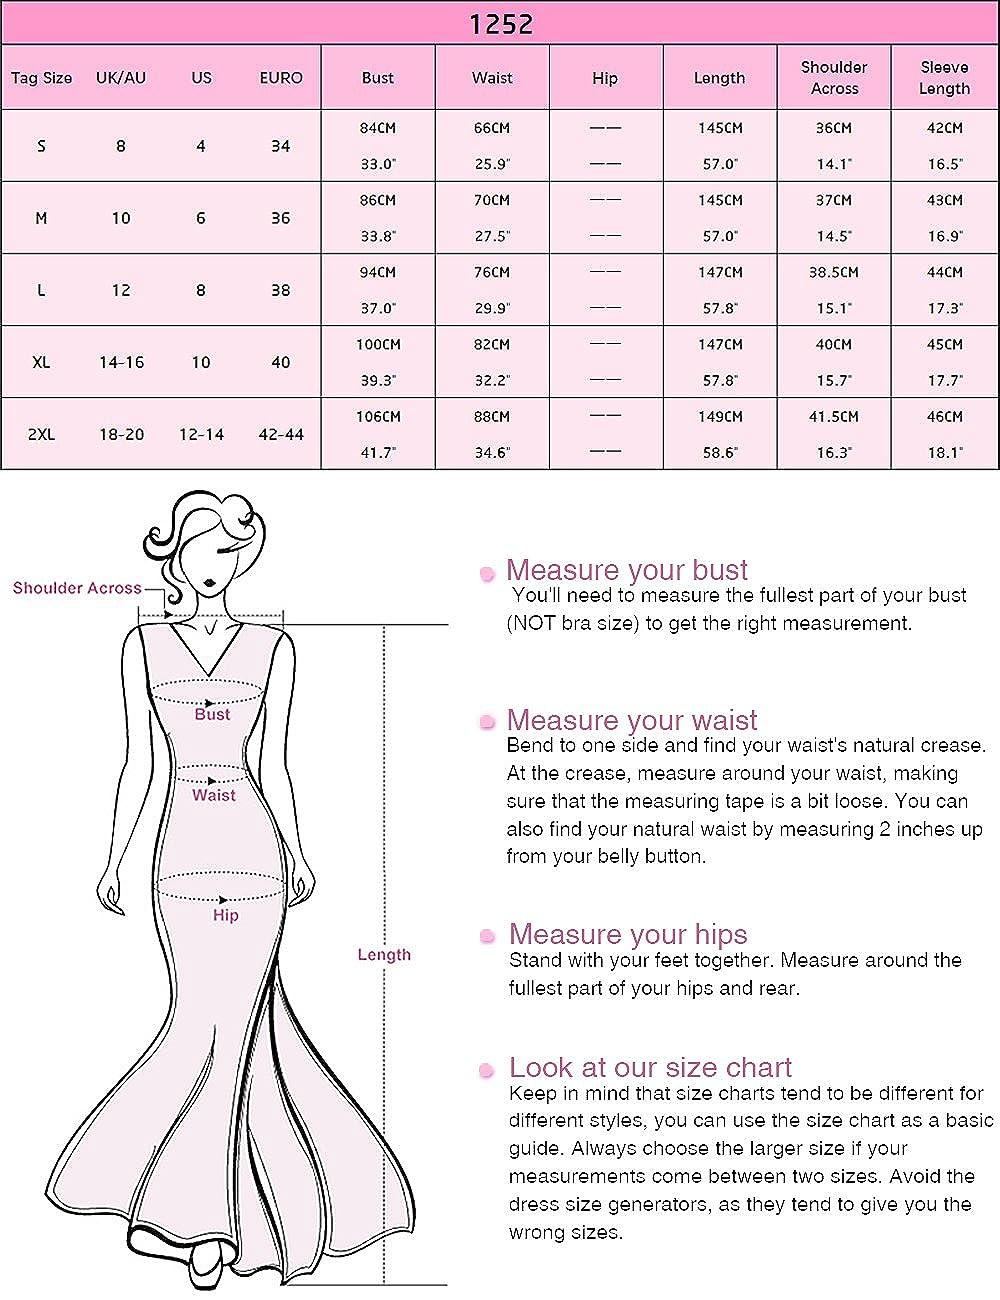 f1566c1217f4c Bust: (S)32-34 inches (M)34-36 inches (L)36-38 inches (XL)38-40 (XXL)40-42  inches. Feature:Hawaiian dresses, Long dress, Floral Print, ...